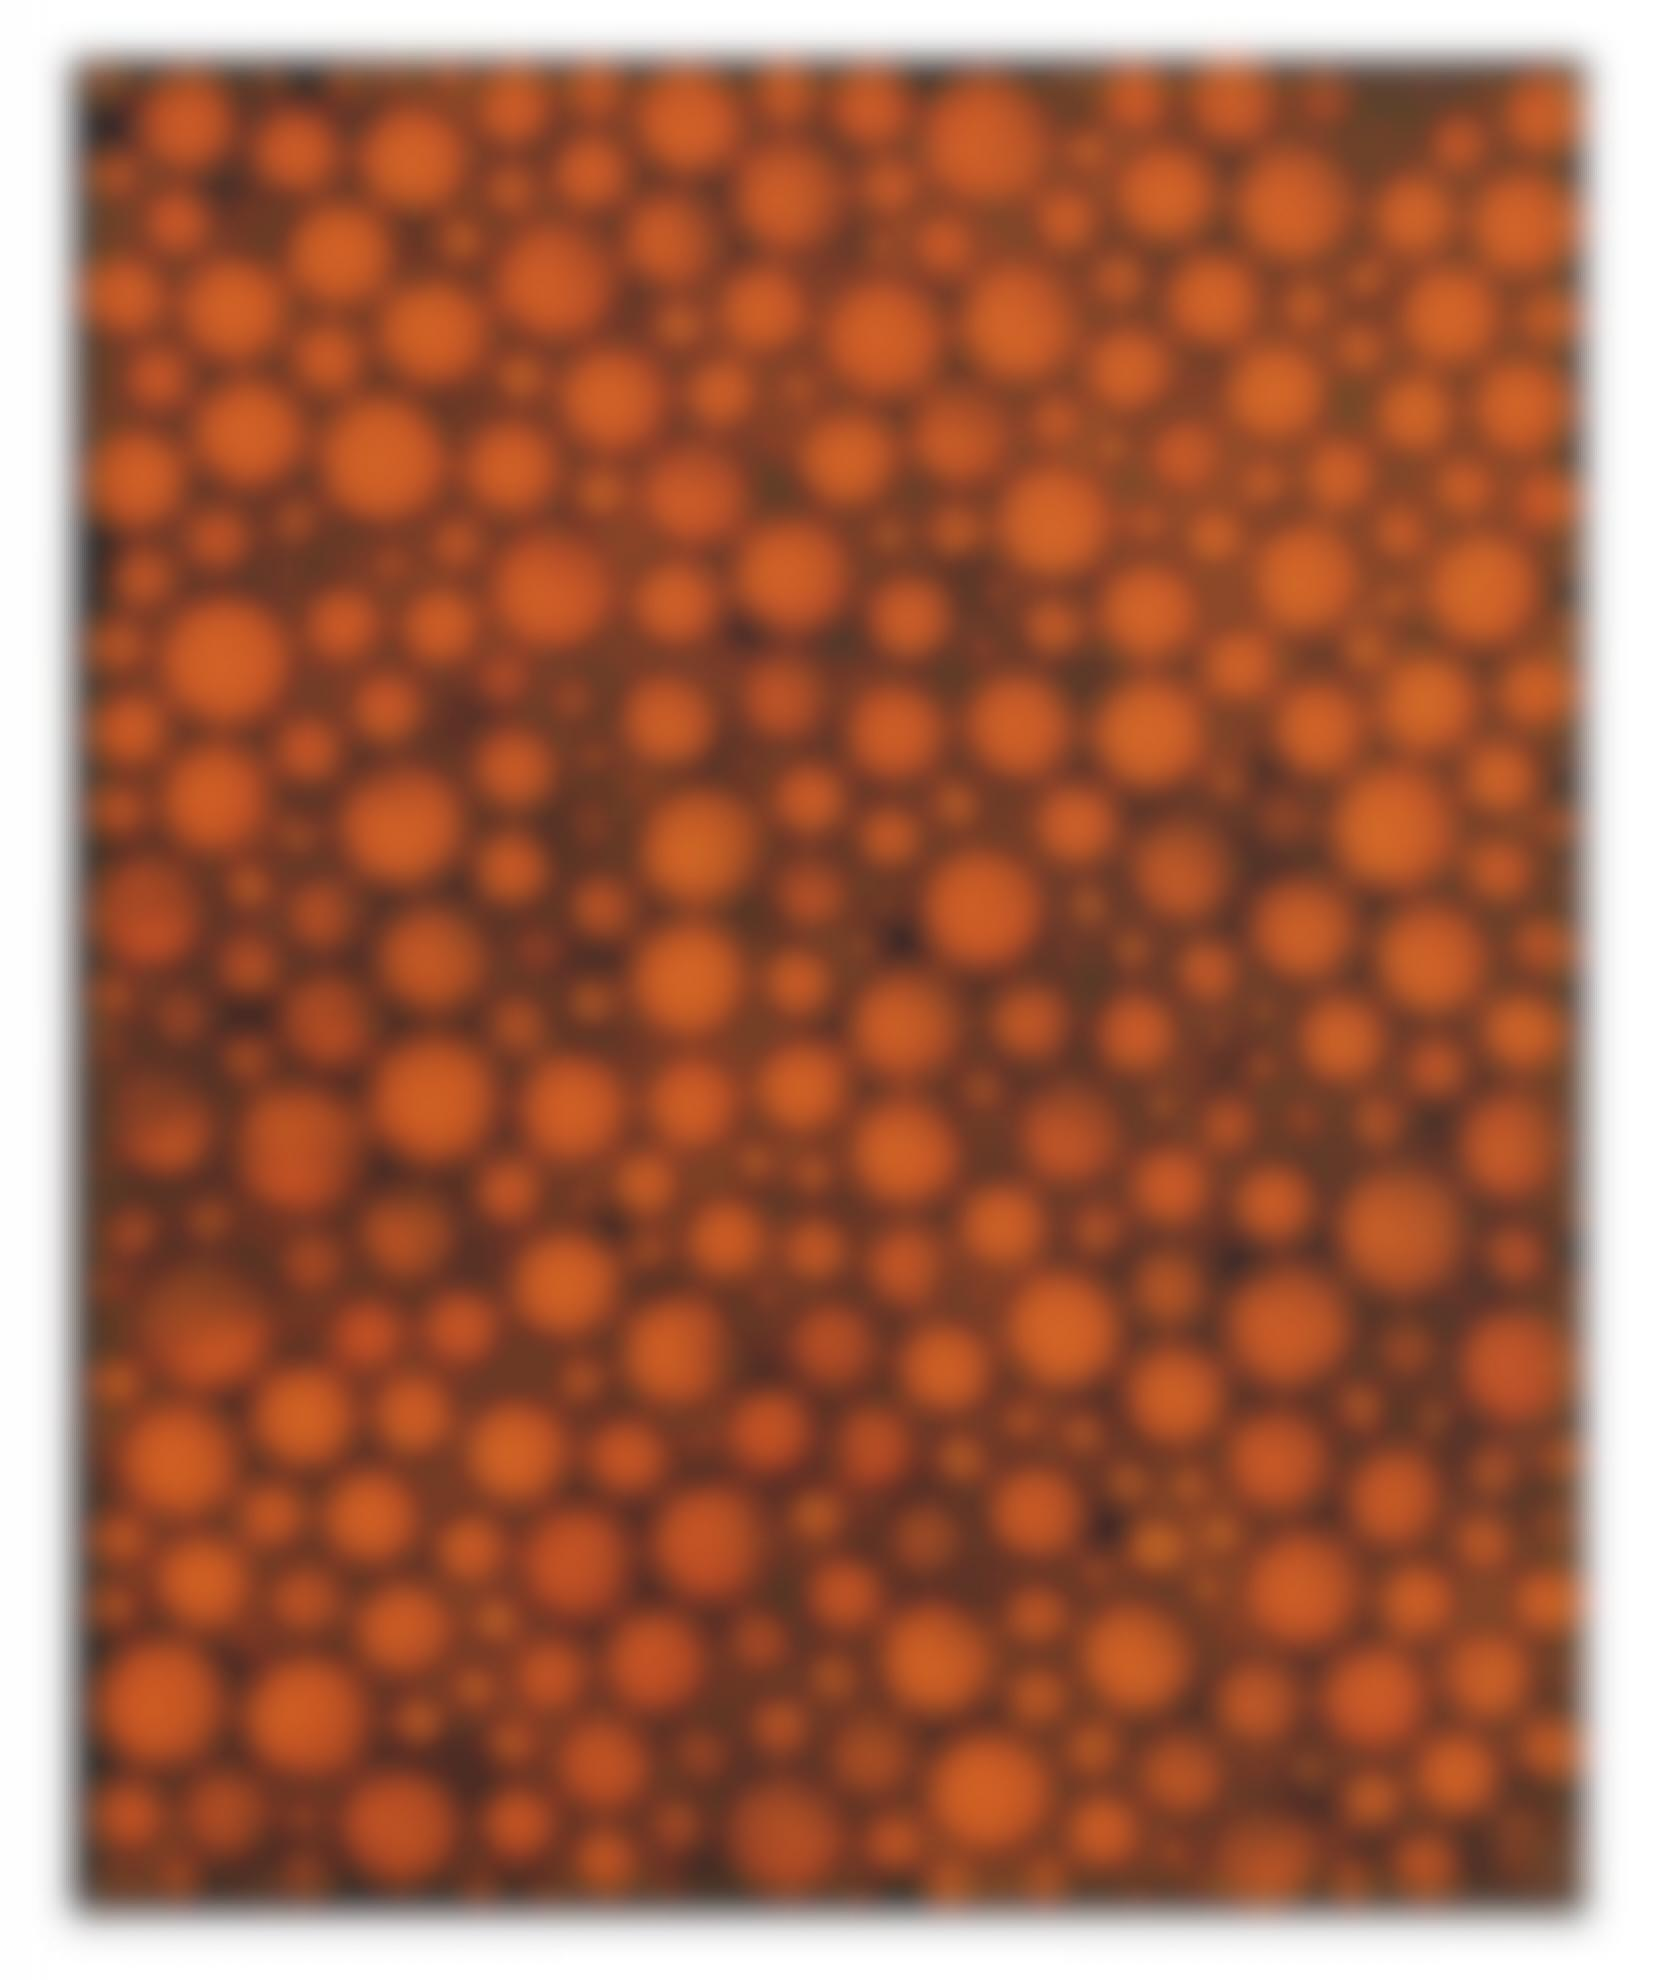 Yayoi Kusama-Kusama, Dots [Bbc], Acrylic On Canvas, 2001-2001